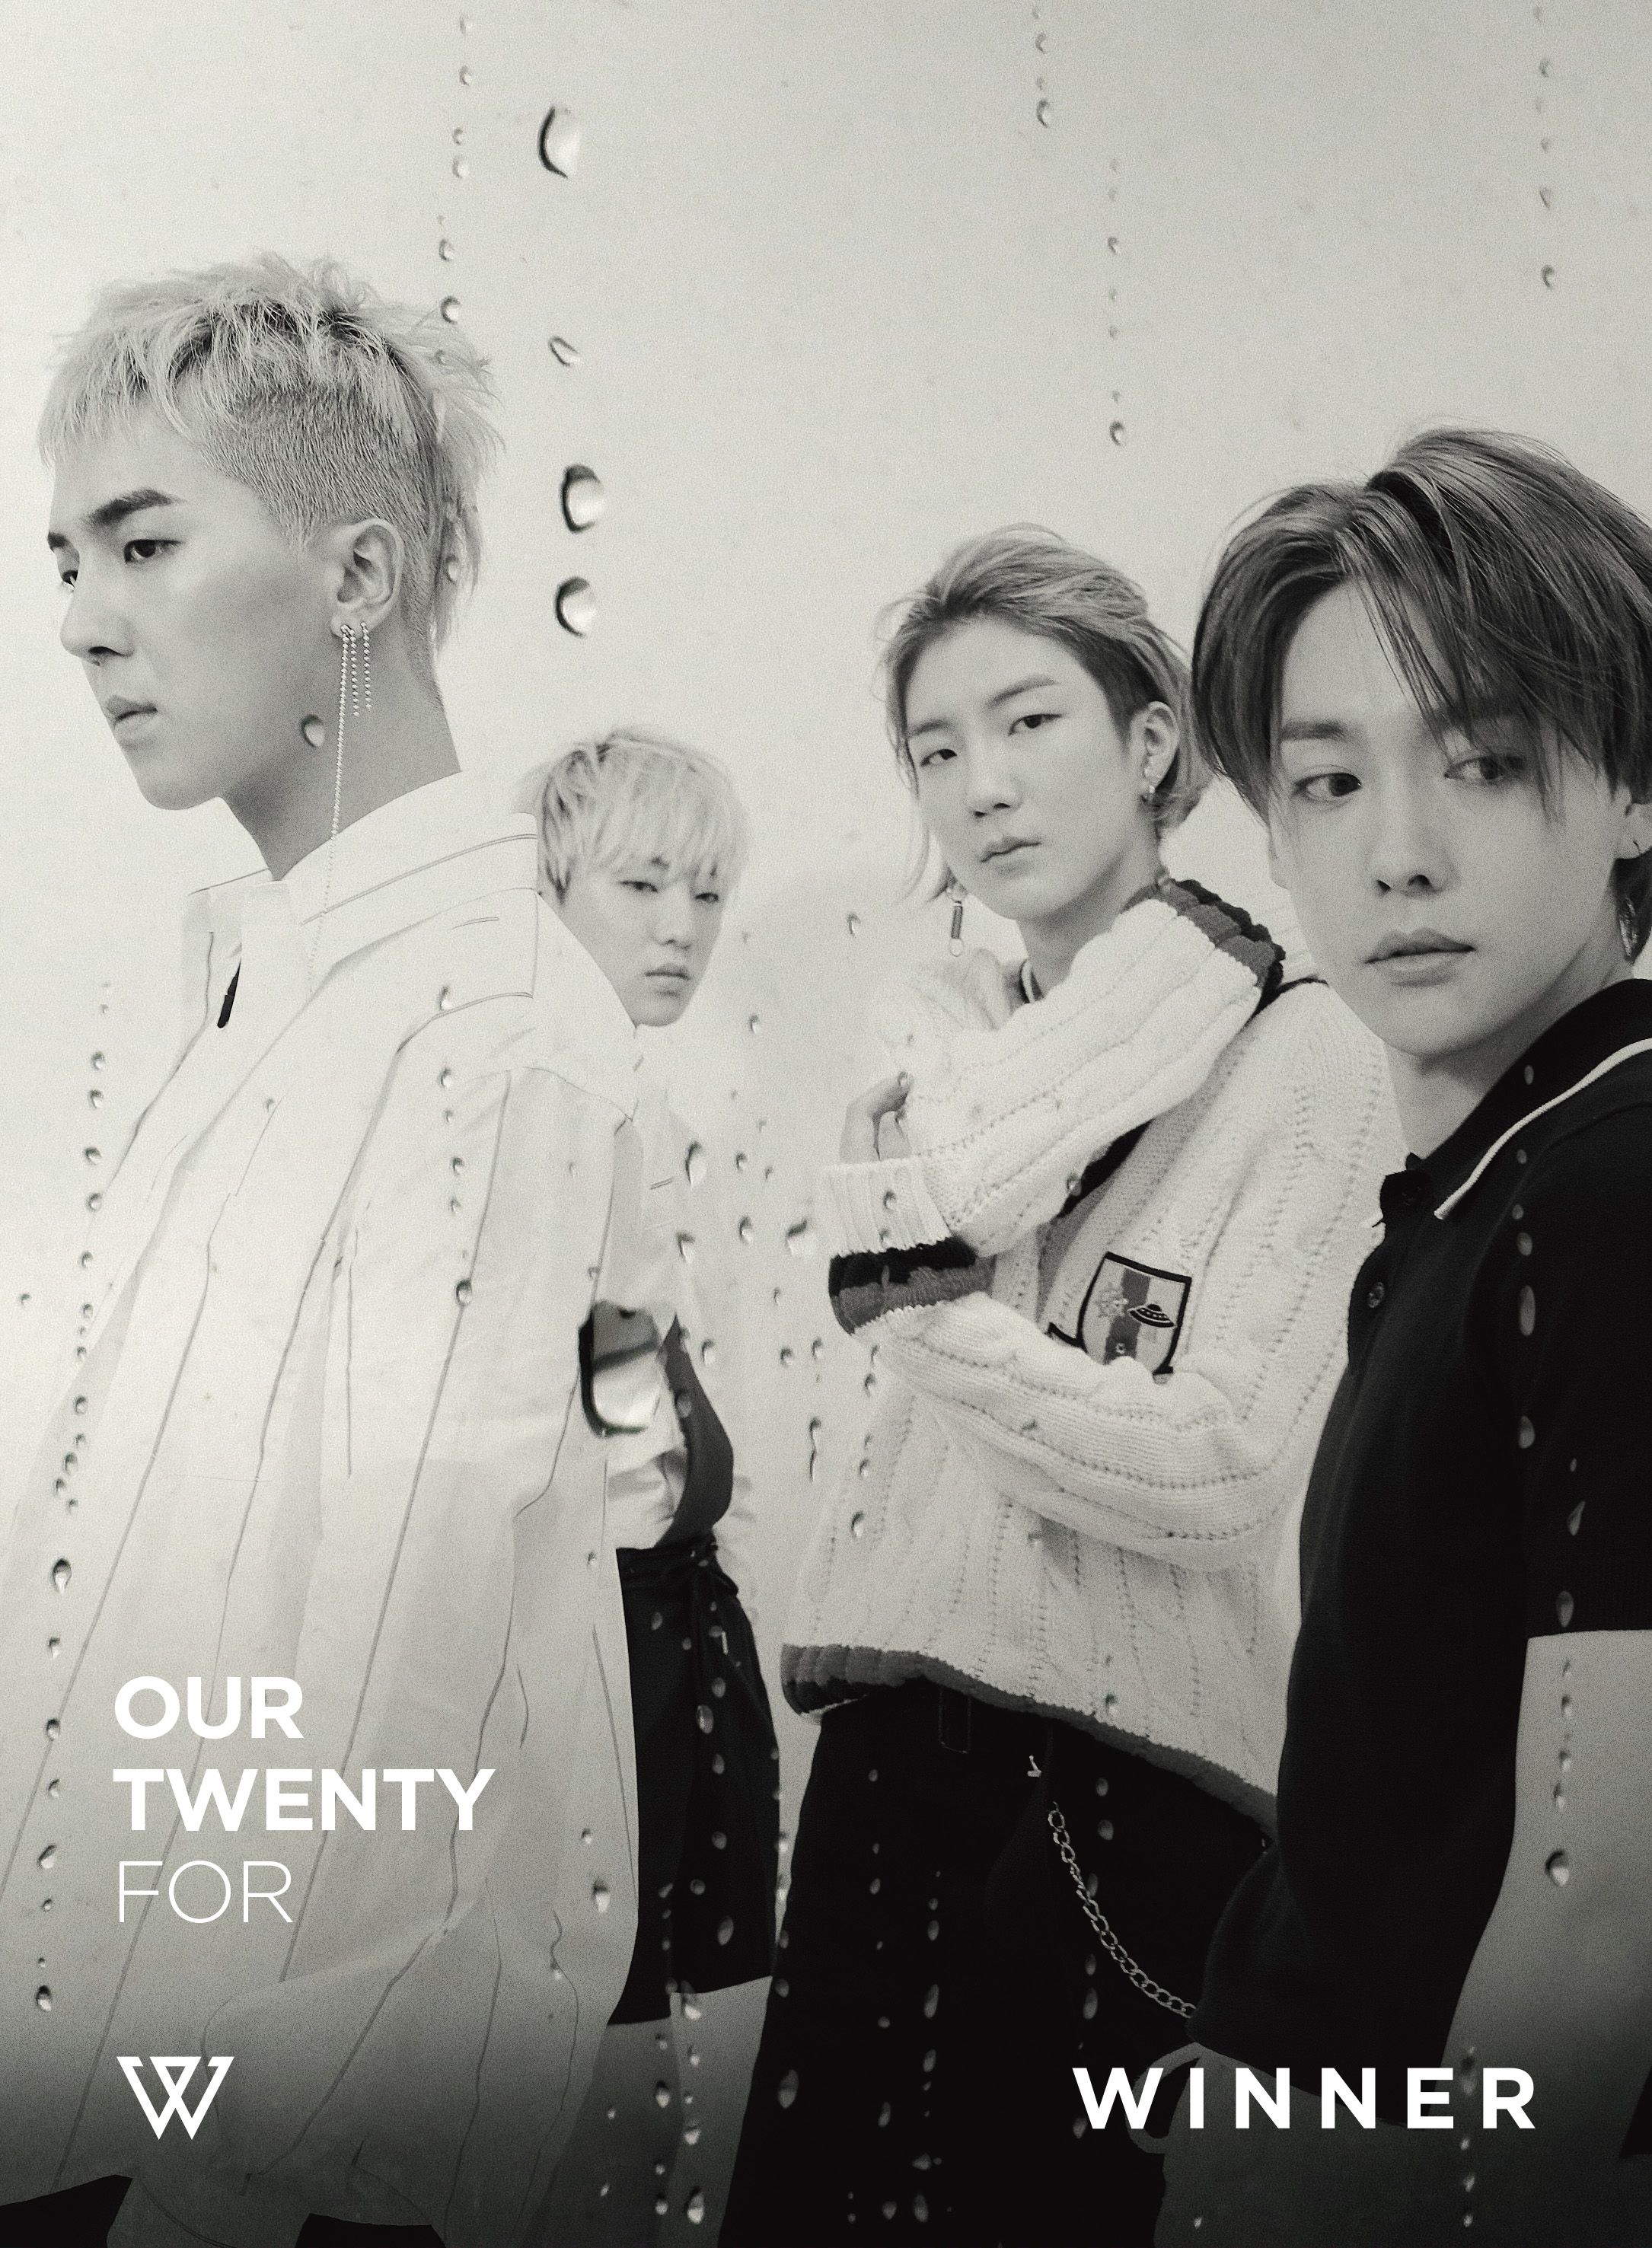 Our Twenty For (альбом)